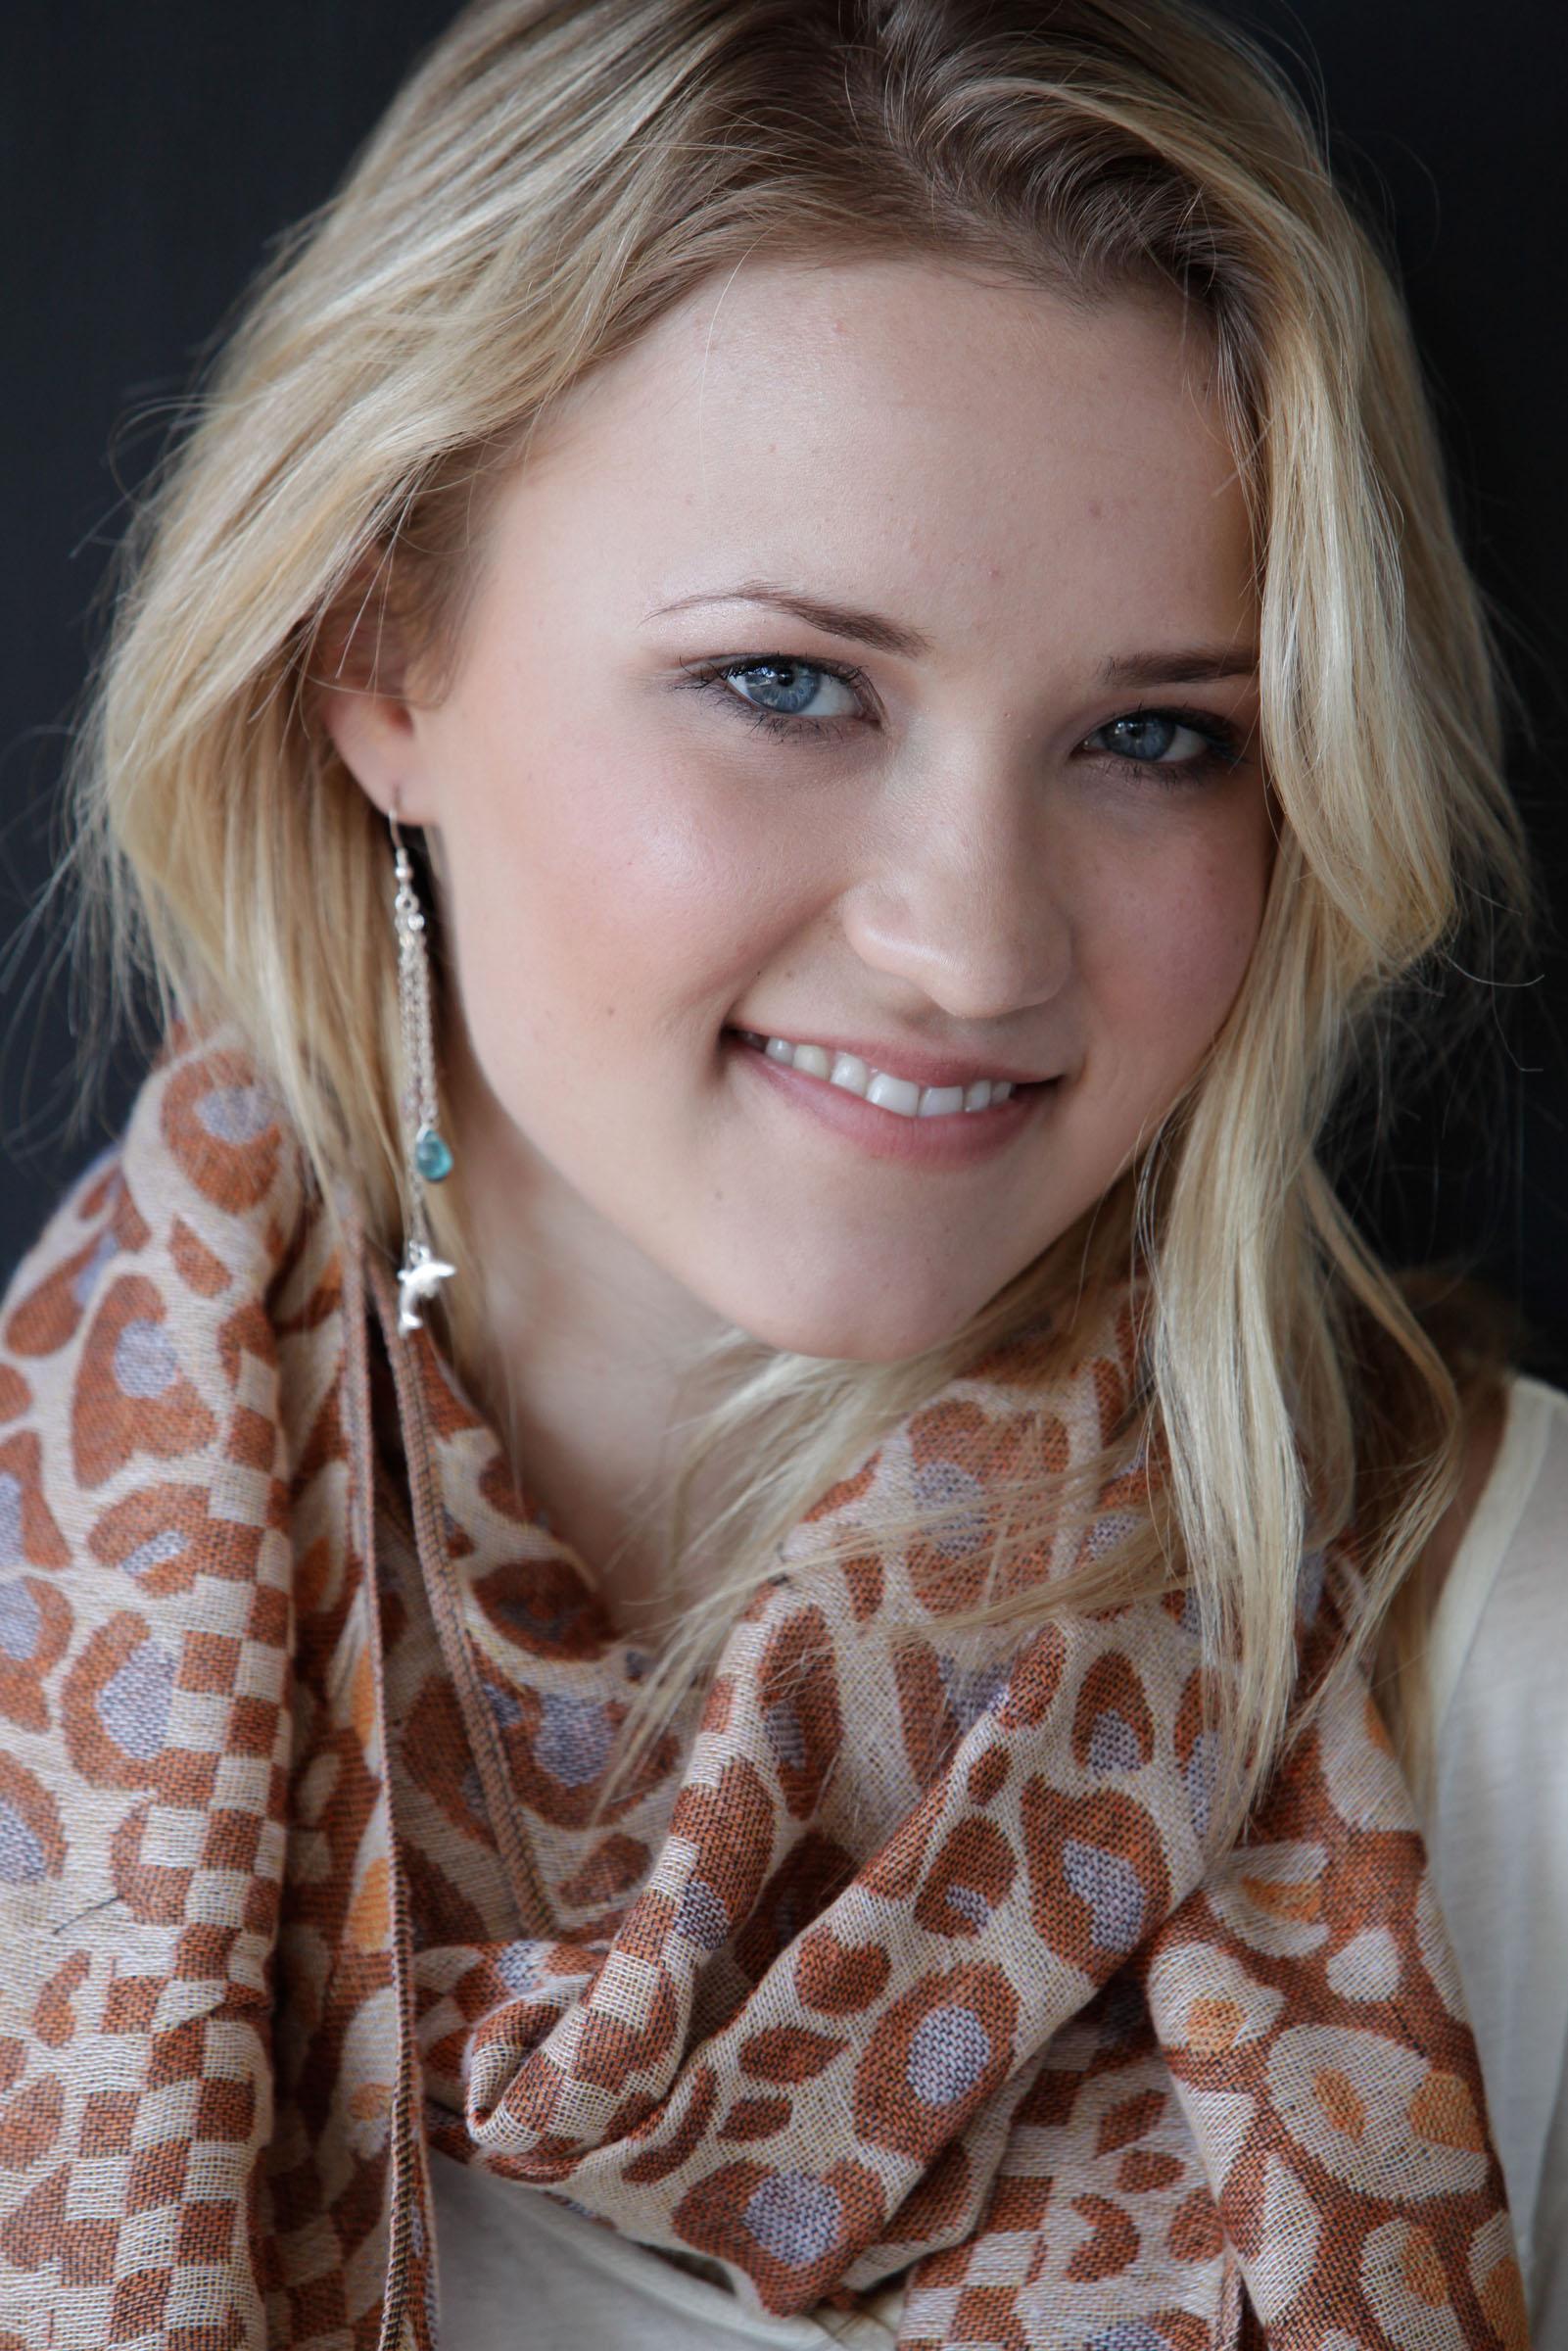 Emily Osment visage